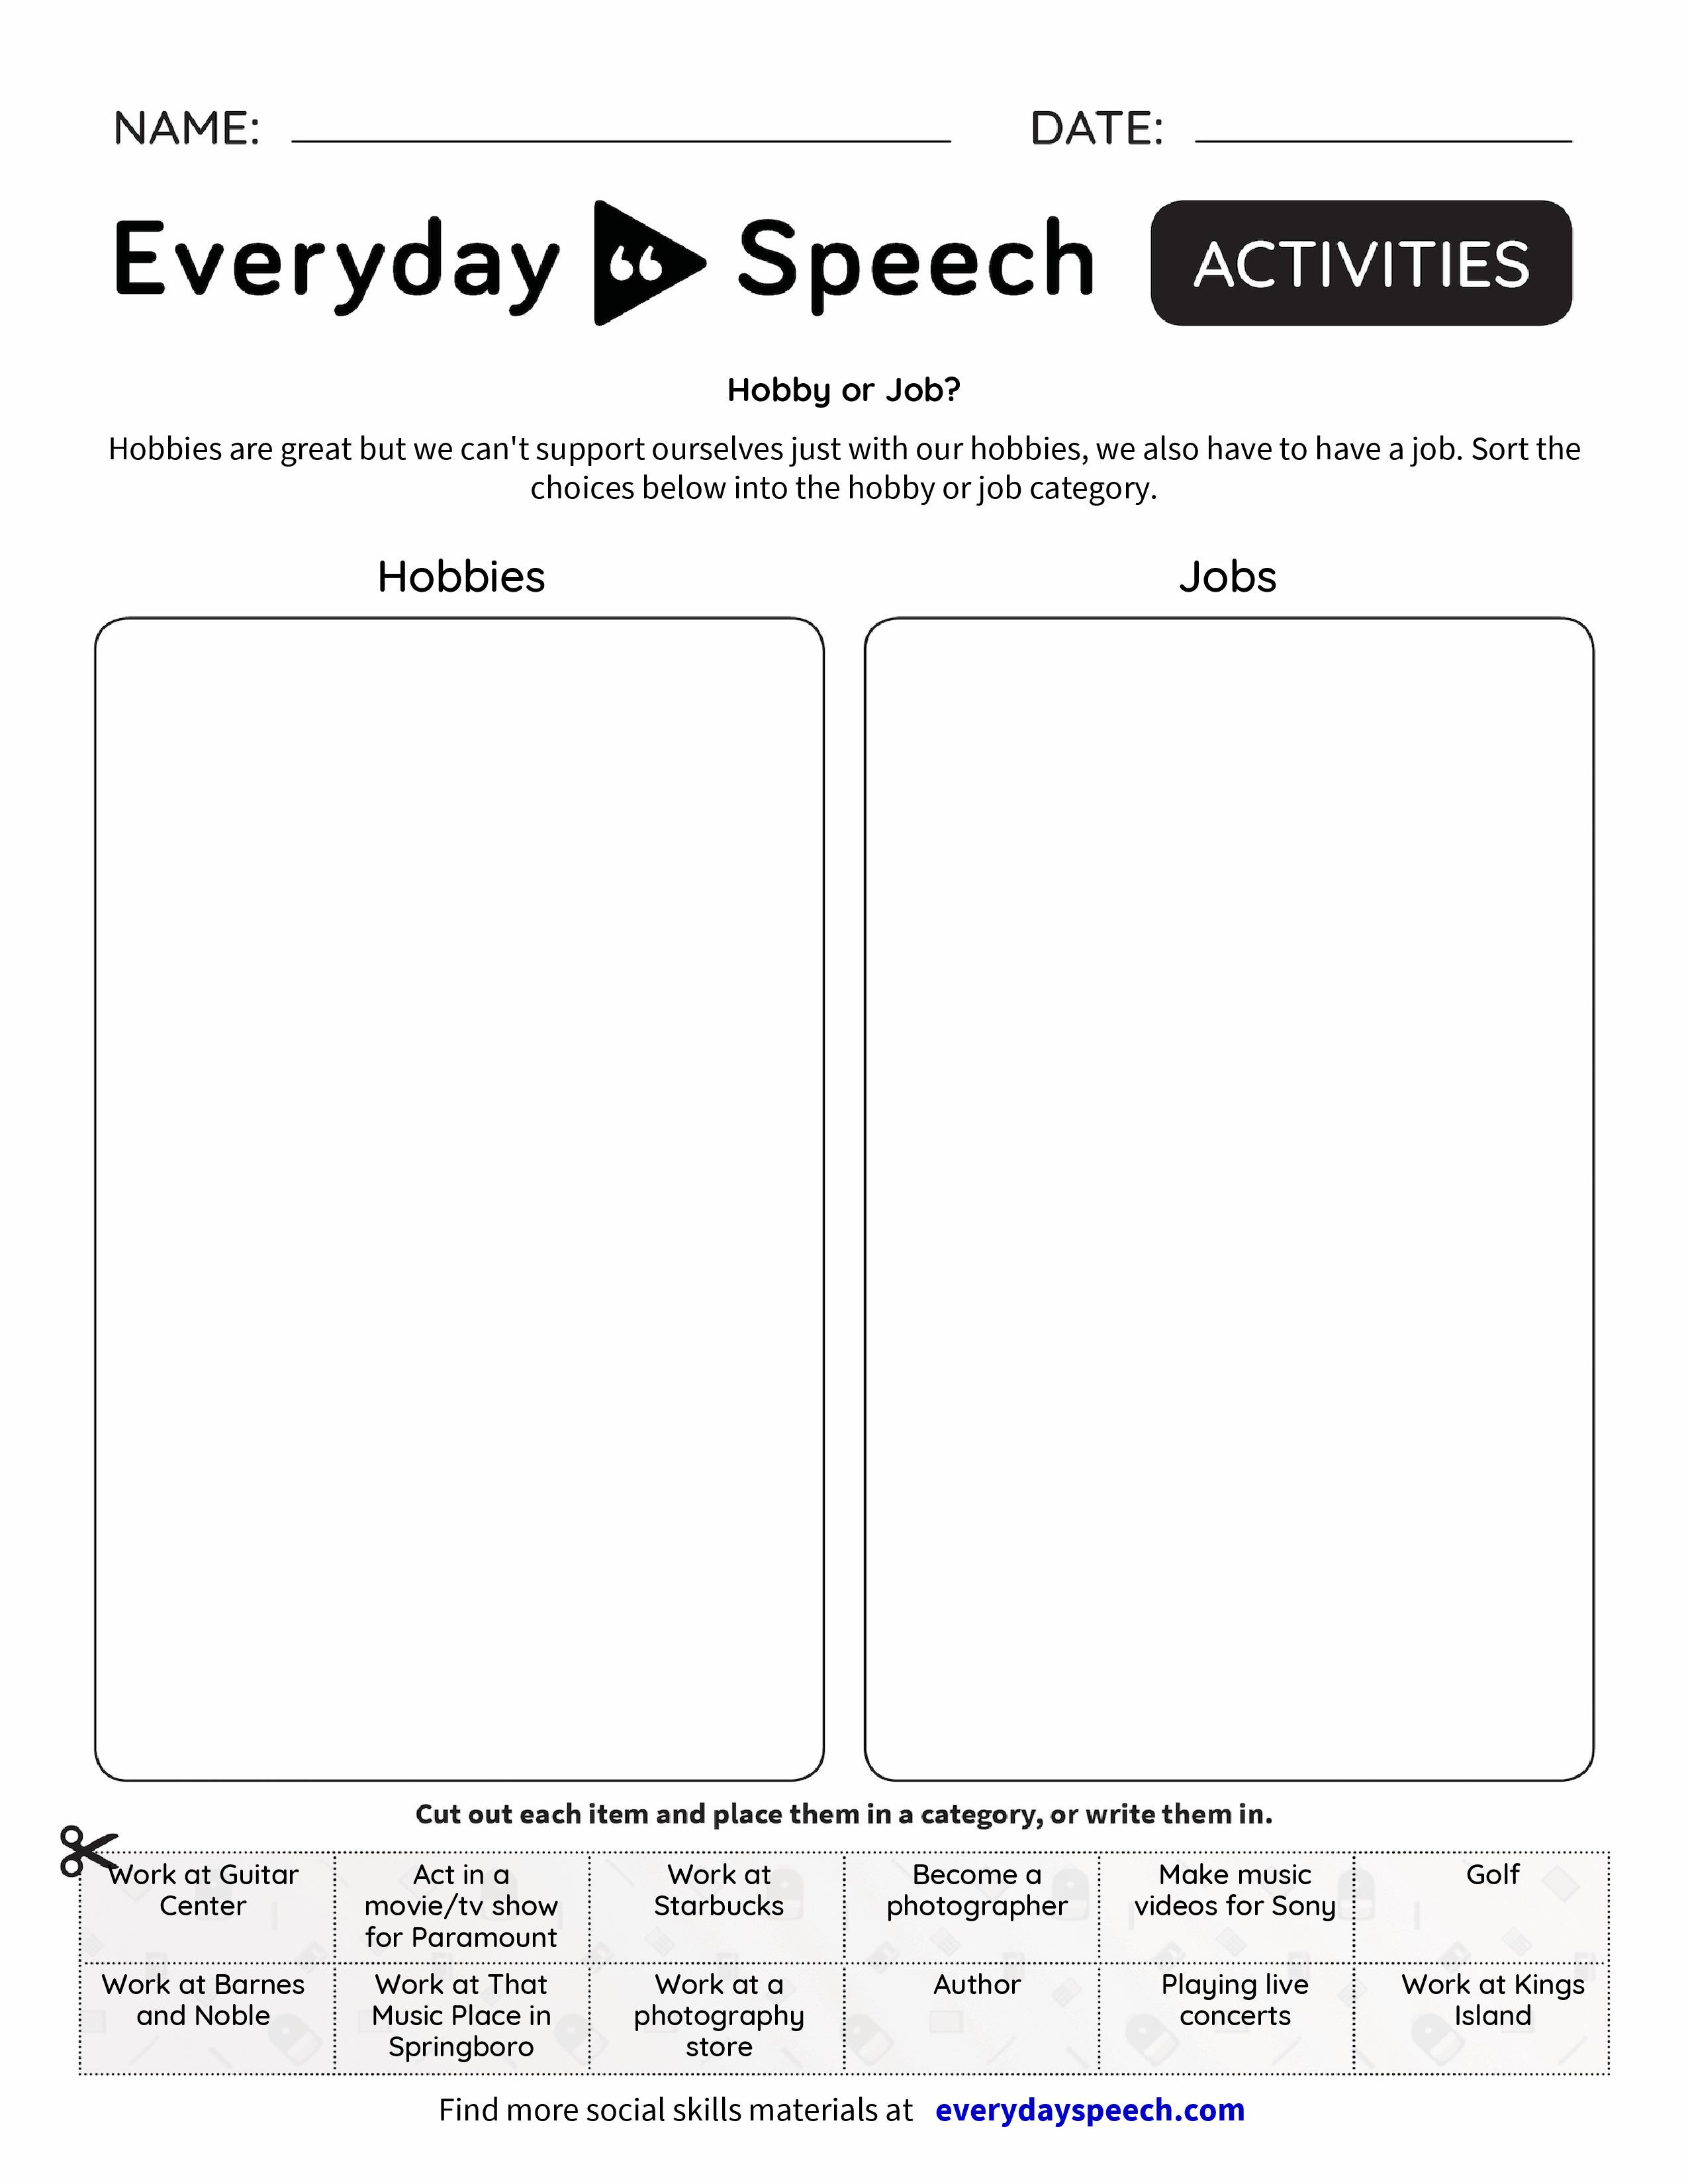 Good Job Worksheet : Hobby or job everyday speech